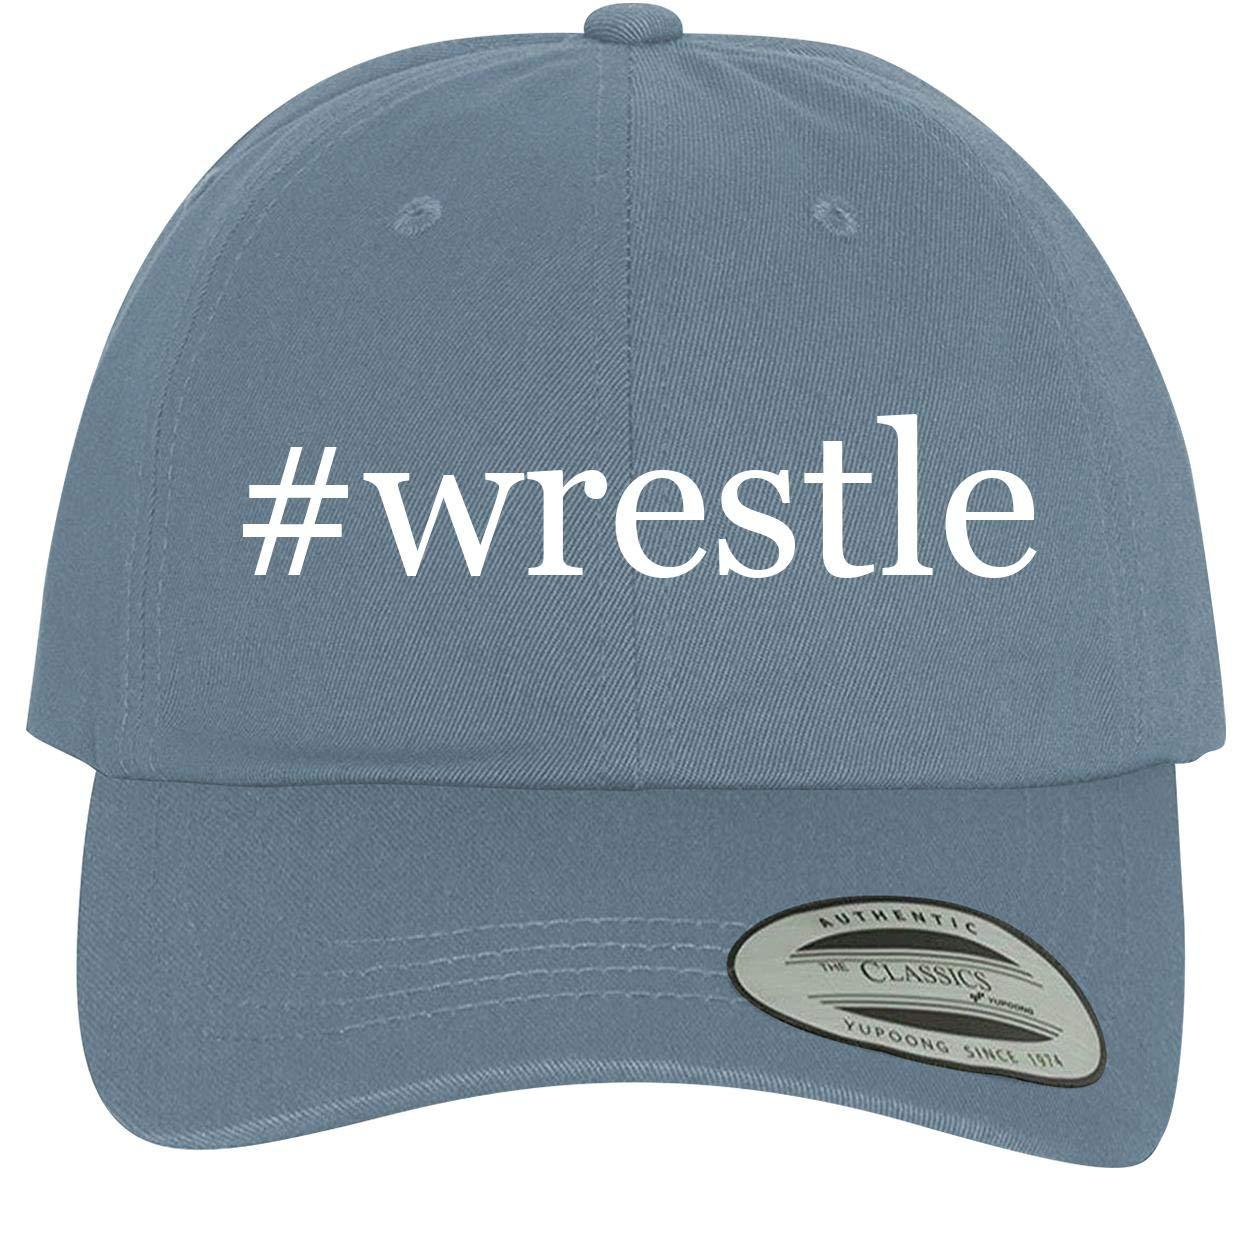 Comfortable Dad Hat Baseball Cap BH Cool Designs #Wrestle